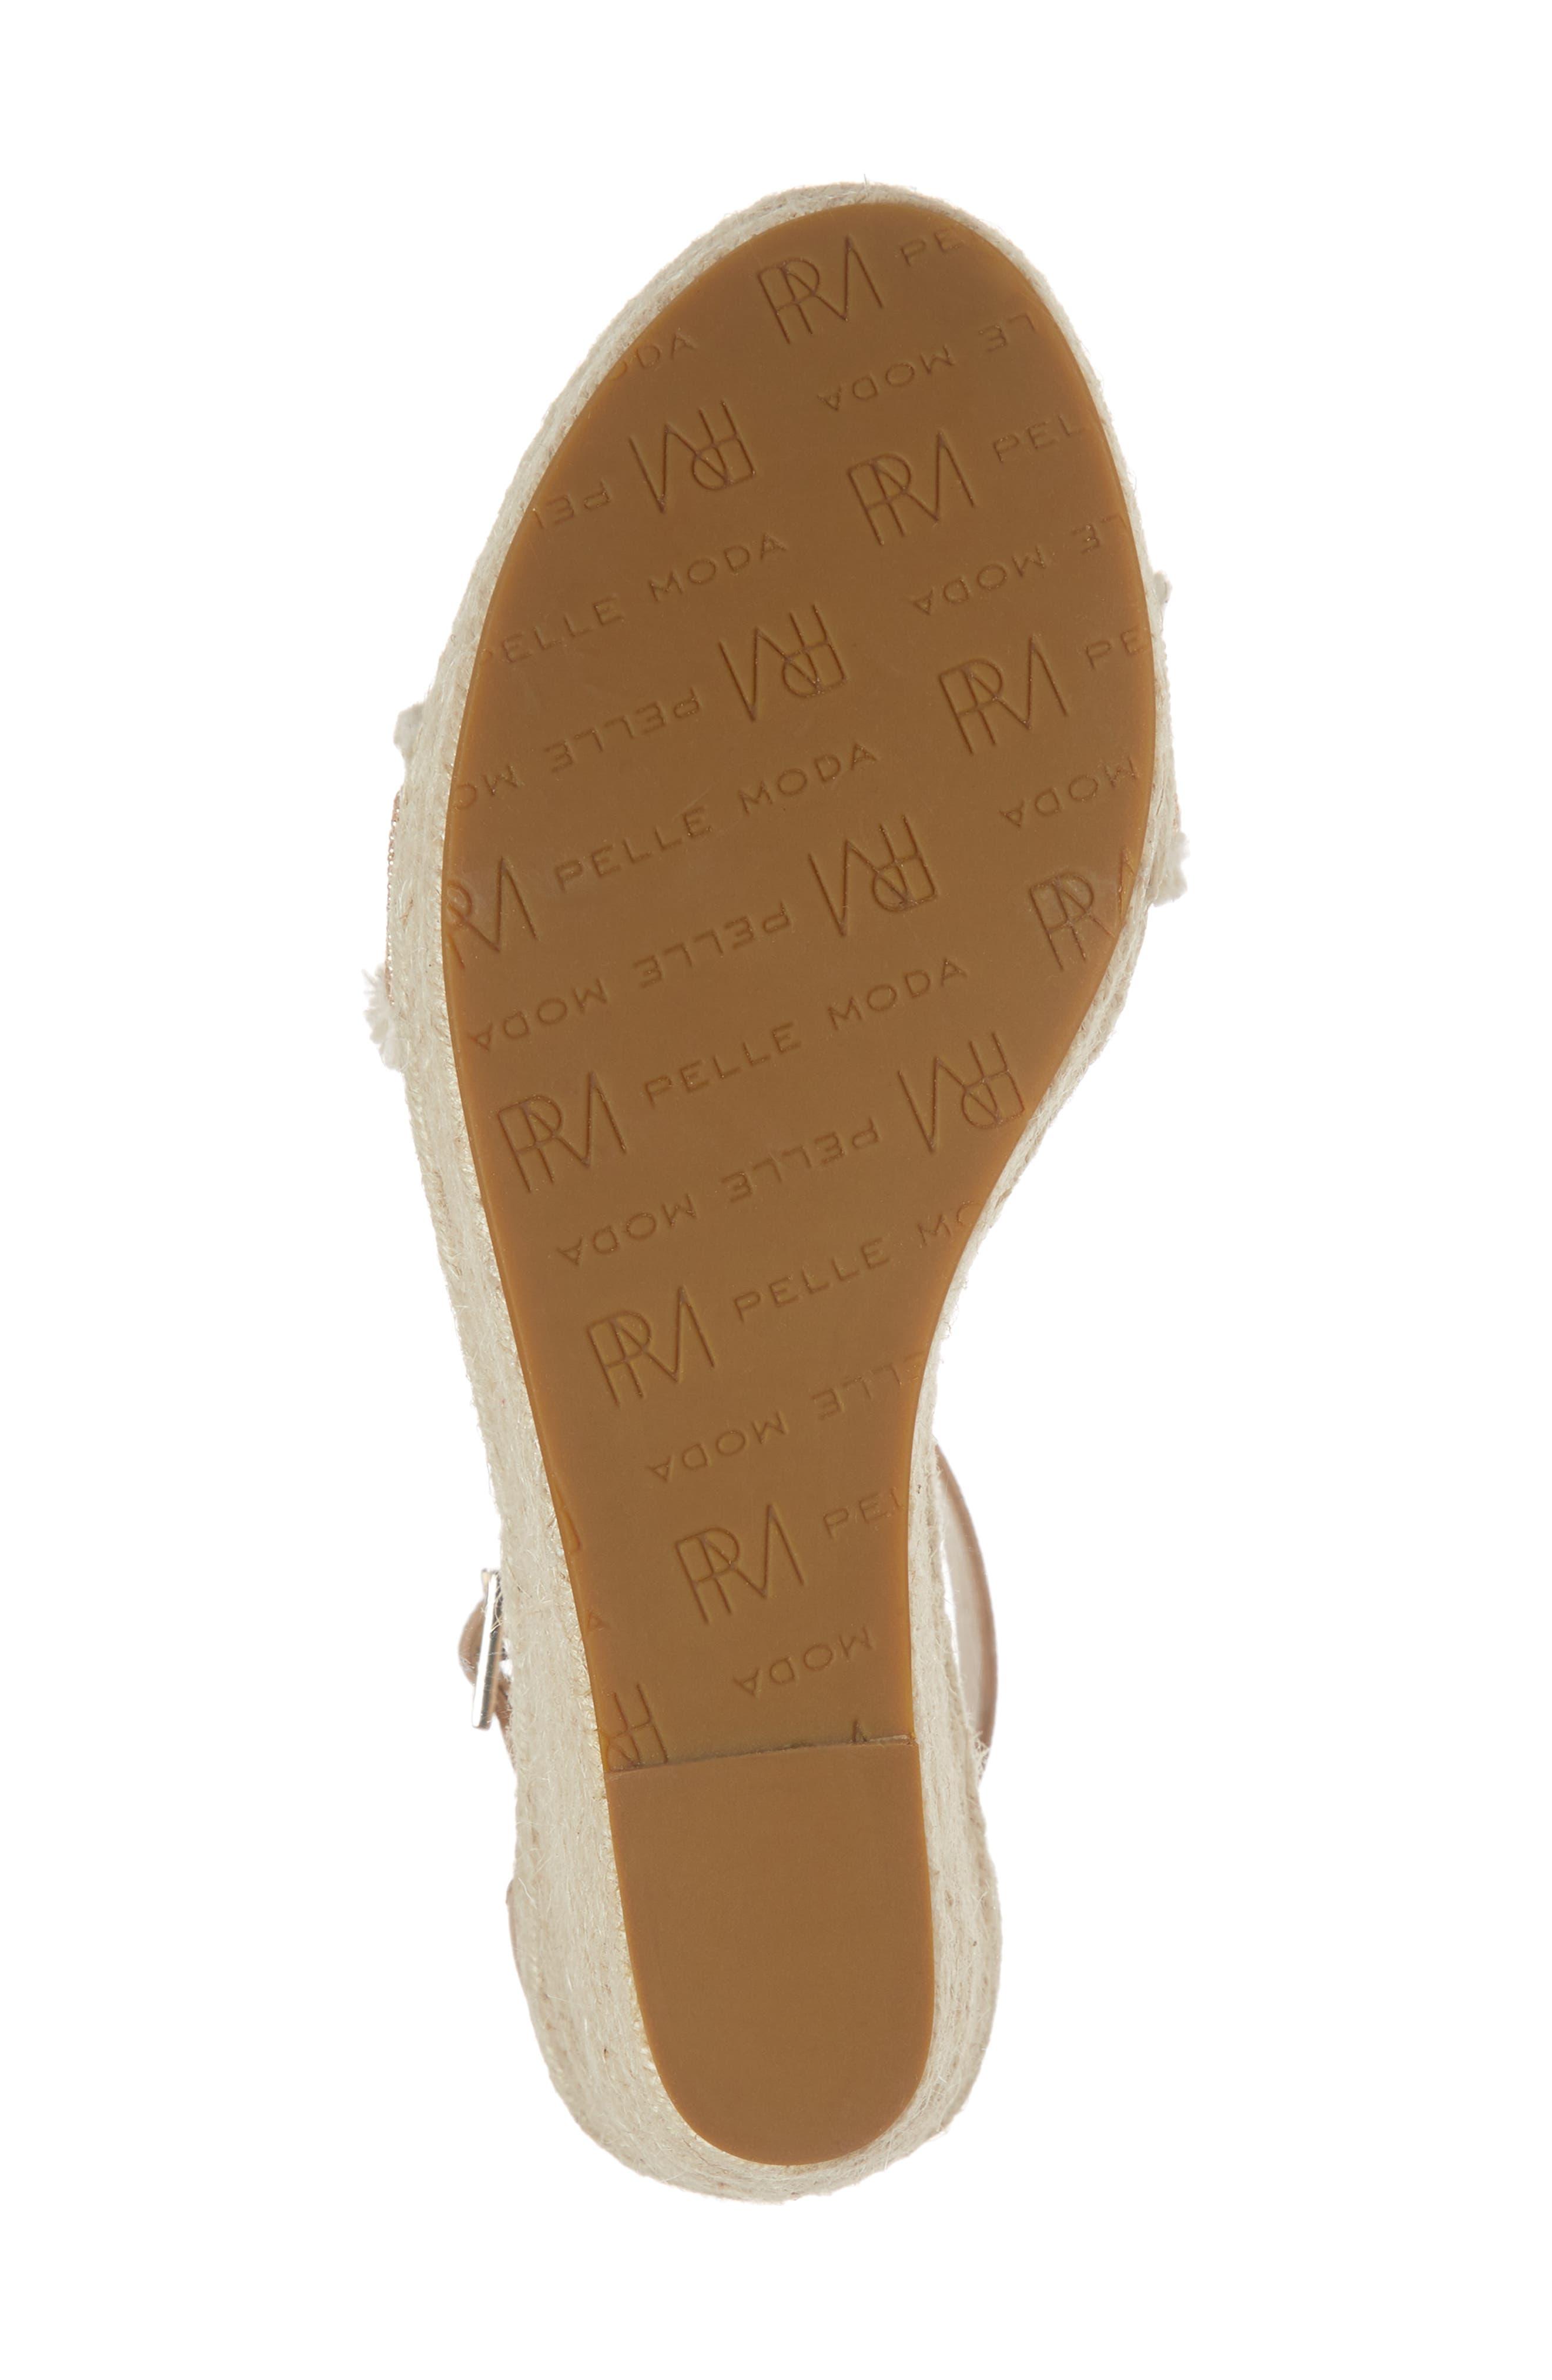 Radley Espadrille Wedge Sandal,                             Alternate thumbnail 6, color,                             Sand Leather